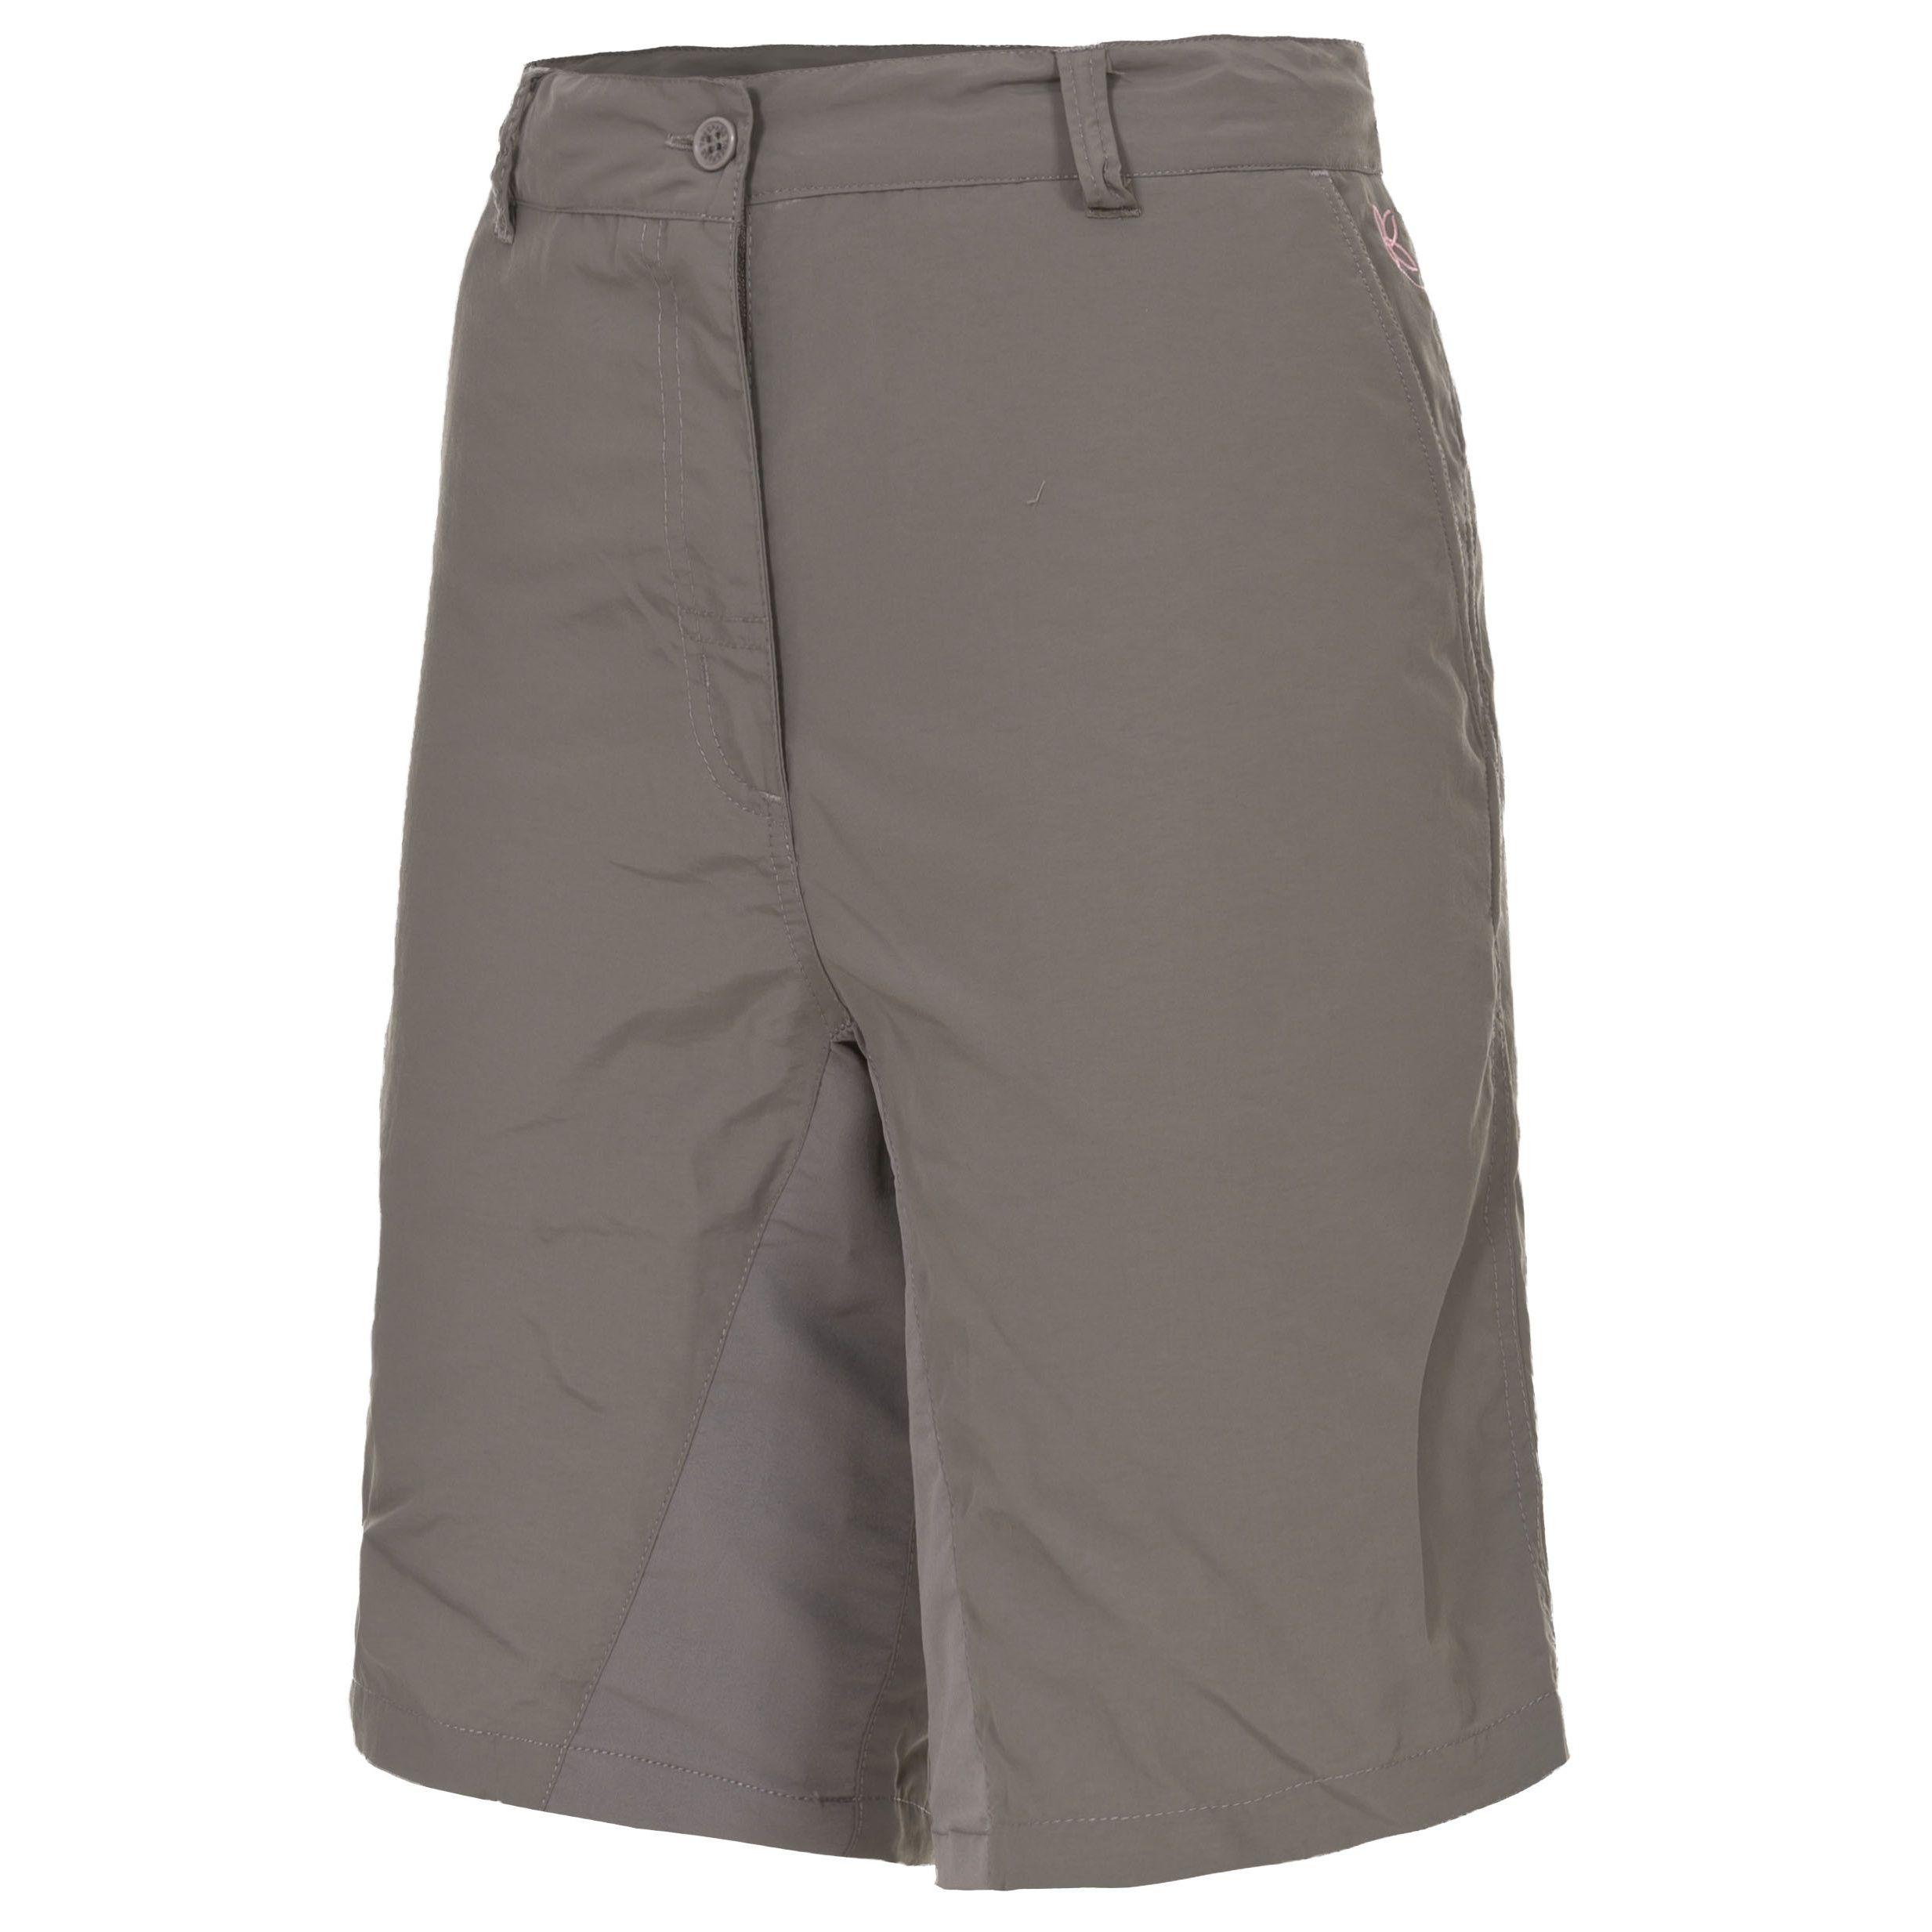 Trespass Womens/Ladies Hashtag Outdoor Shorts